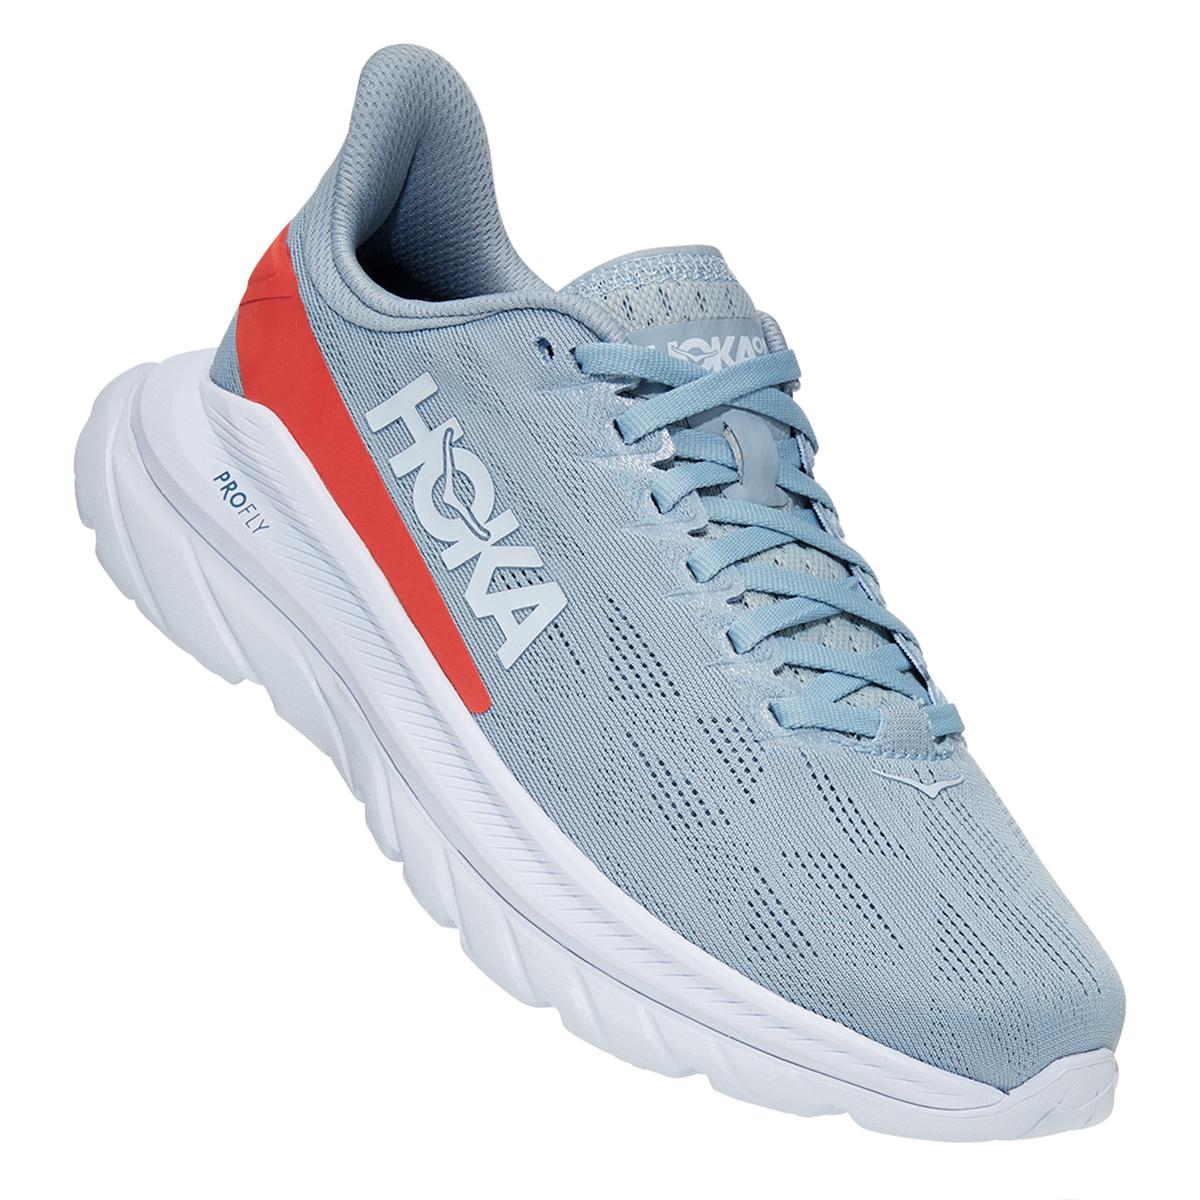 Women's Hoka One One Mach 4 Running Shoe - Color: Blue Fog/Hot Coral - Size: 5 - Width: Regular, Blue Fog/Hot Coral, large, image 4